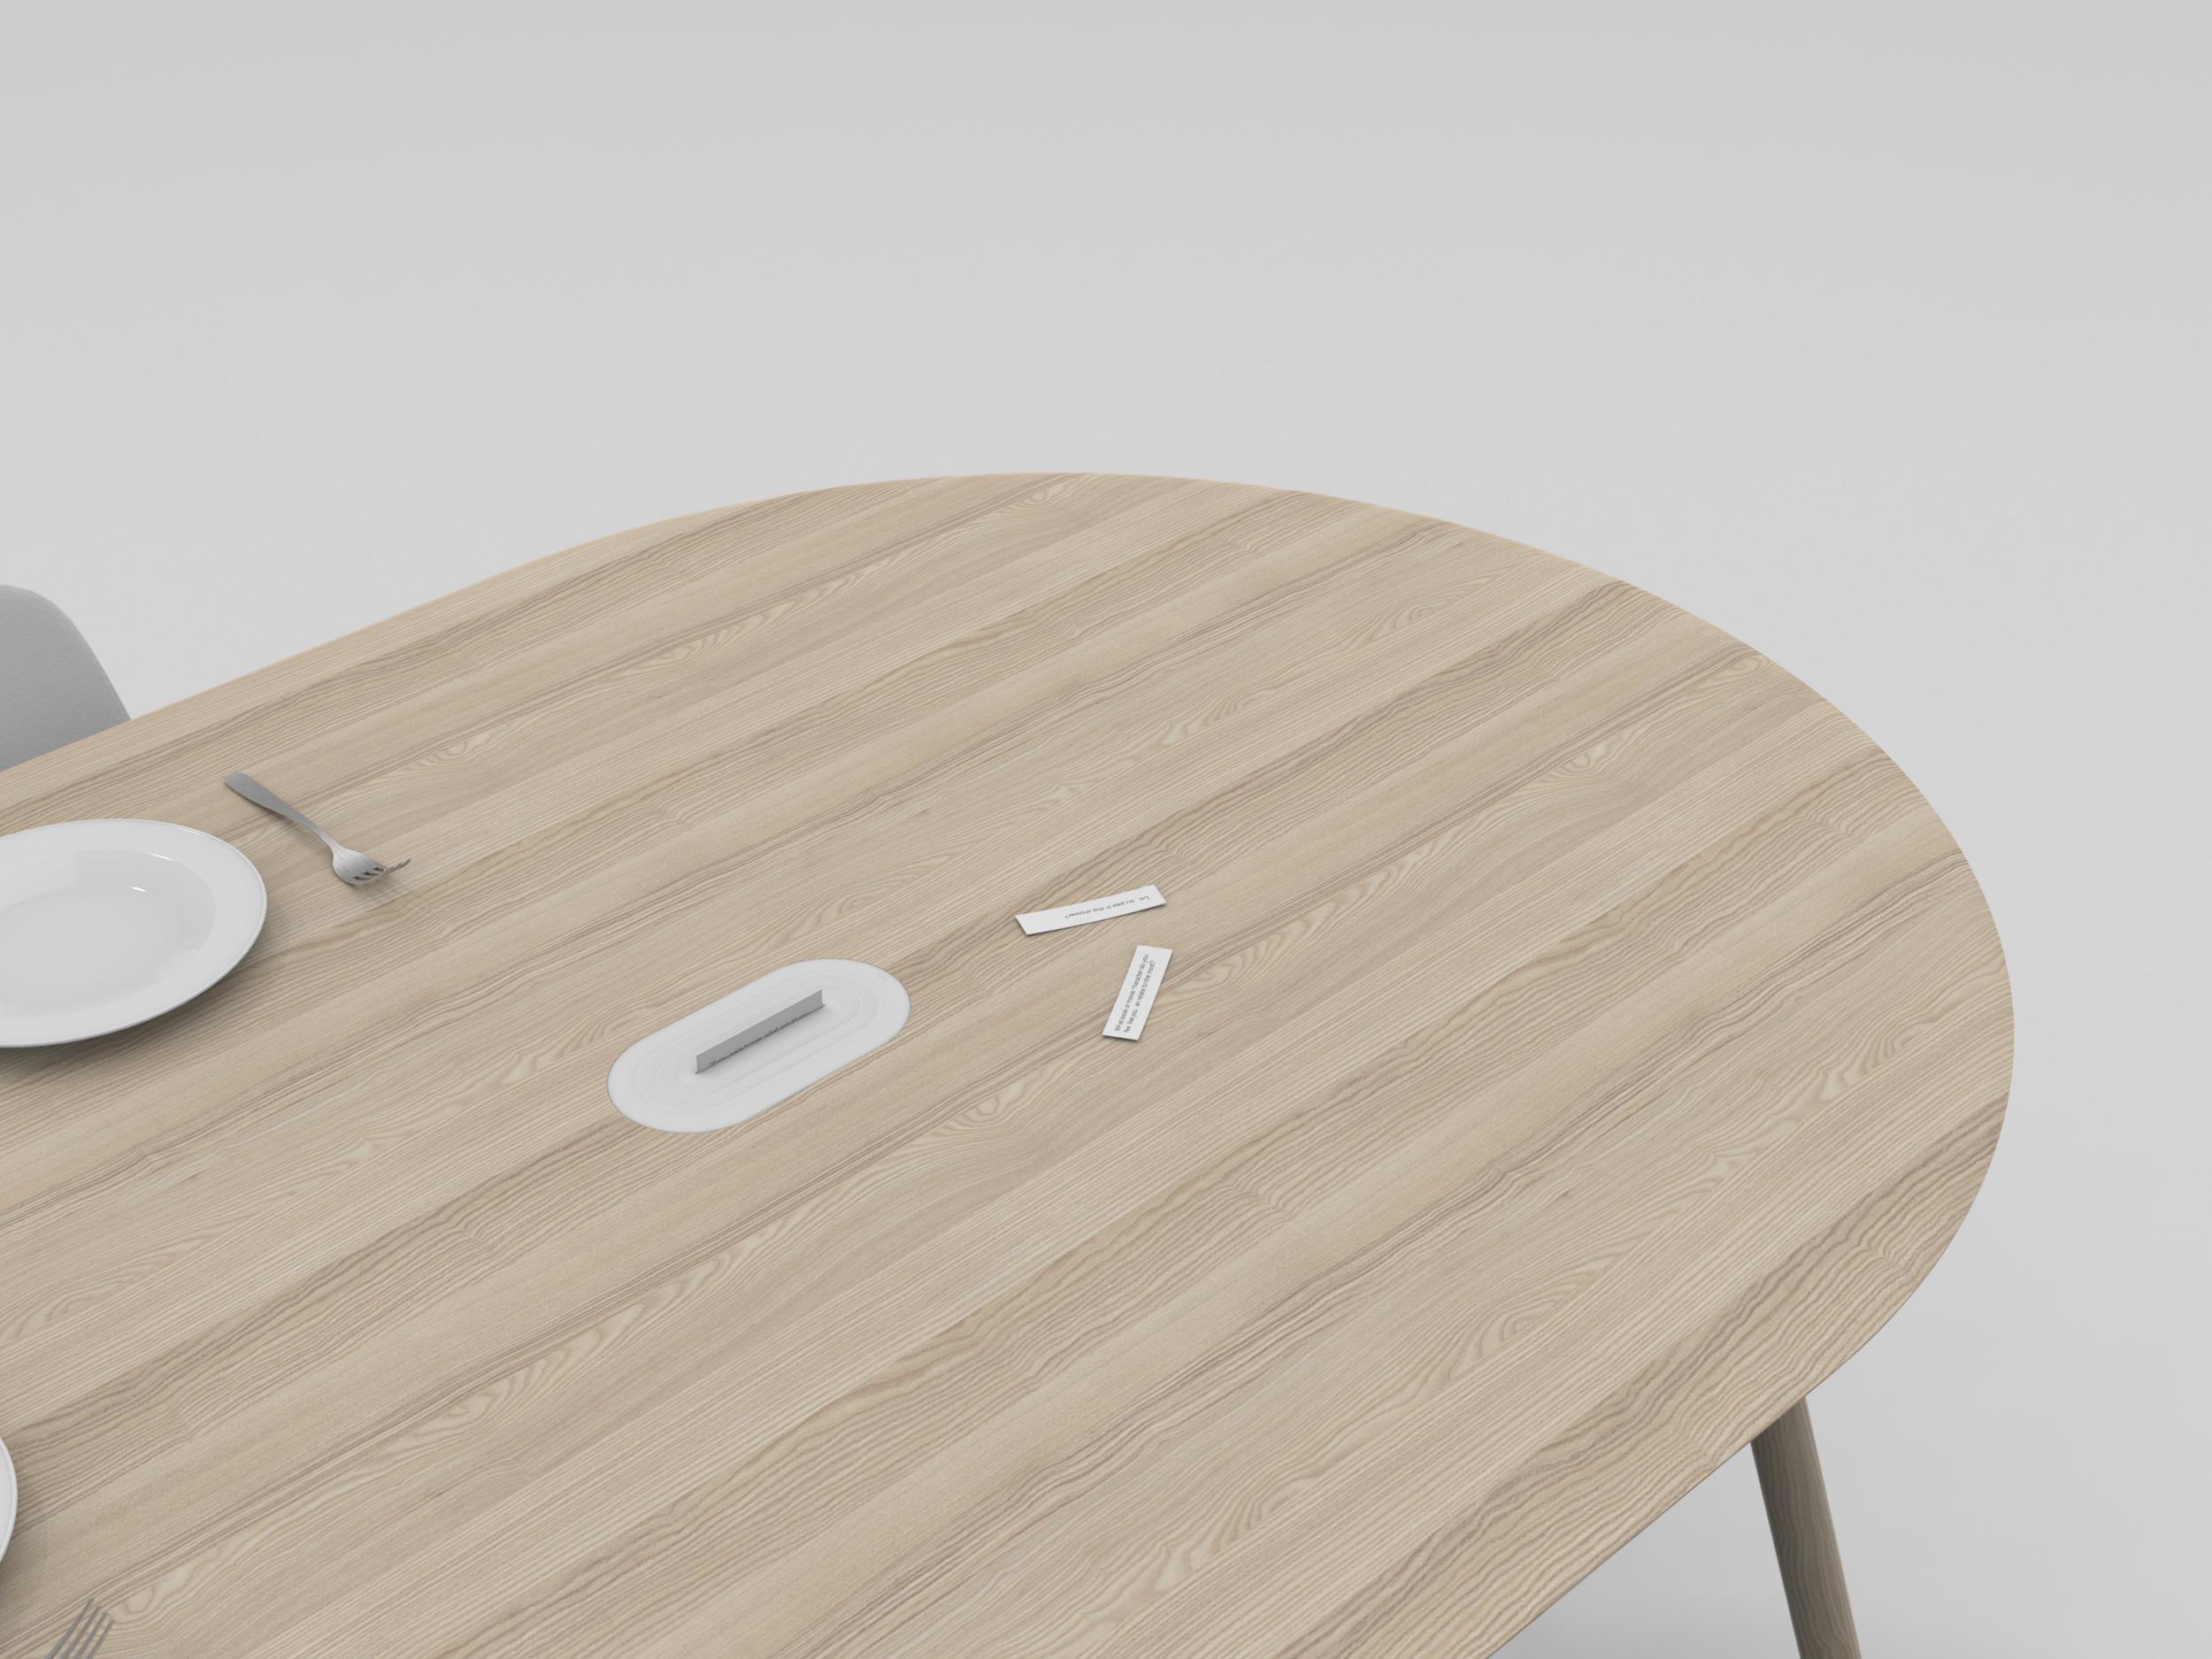 Final Table Render 2.60.png